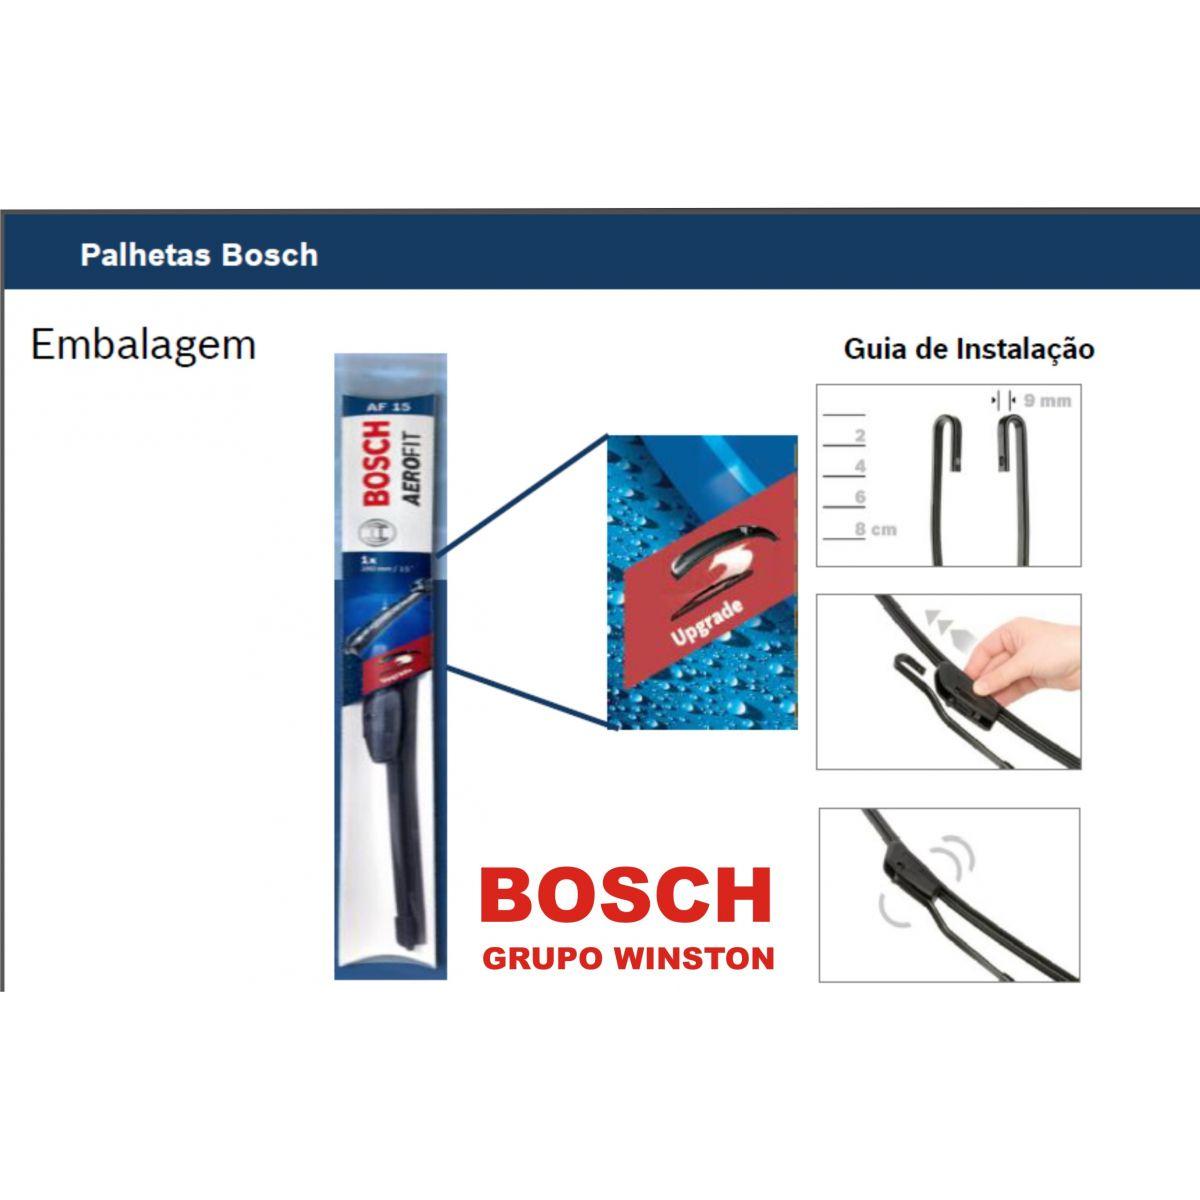 Palheta Bosch Aerofit Limpador de para brisa Bosch FIAT Palio I / Yong Palio II / III / IV Palio Adventure I / II / III / IV Palio Weekend I / II / III / IV Siena Strada I / II / III / IV